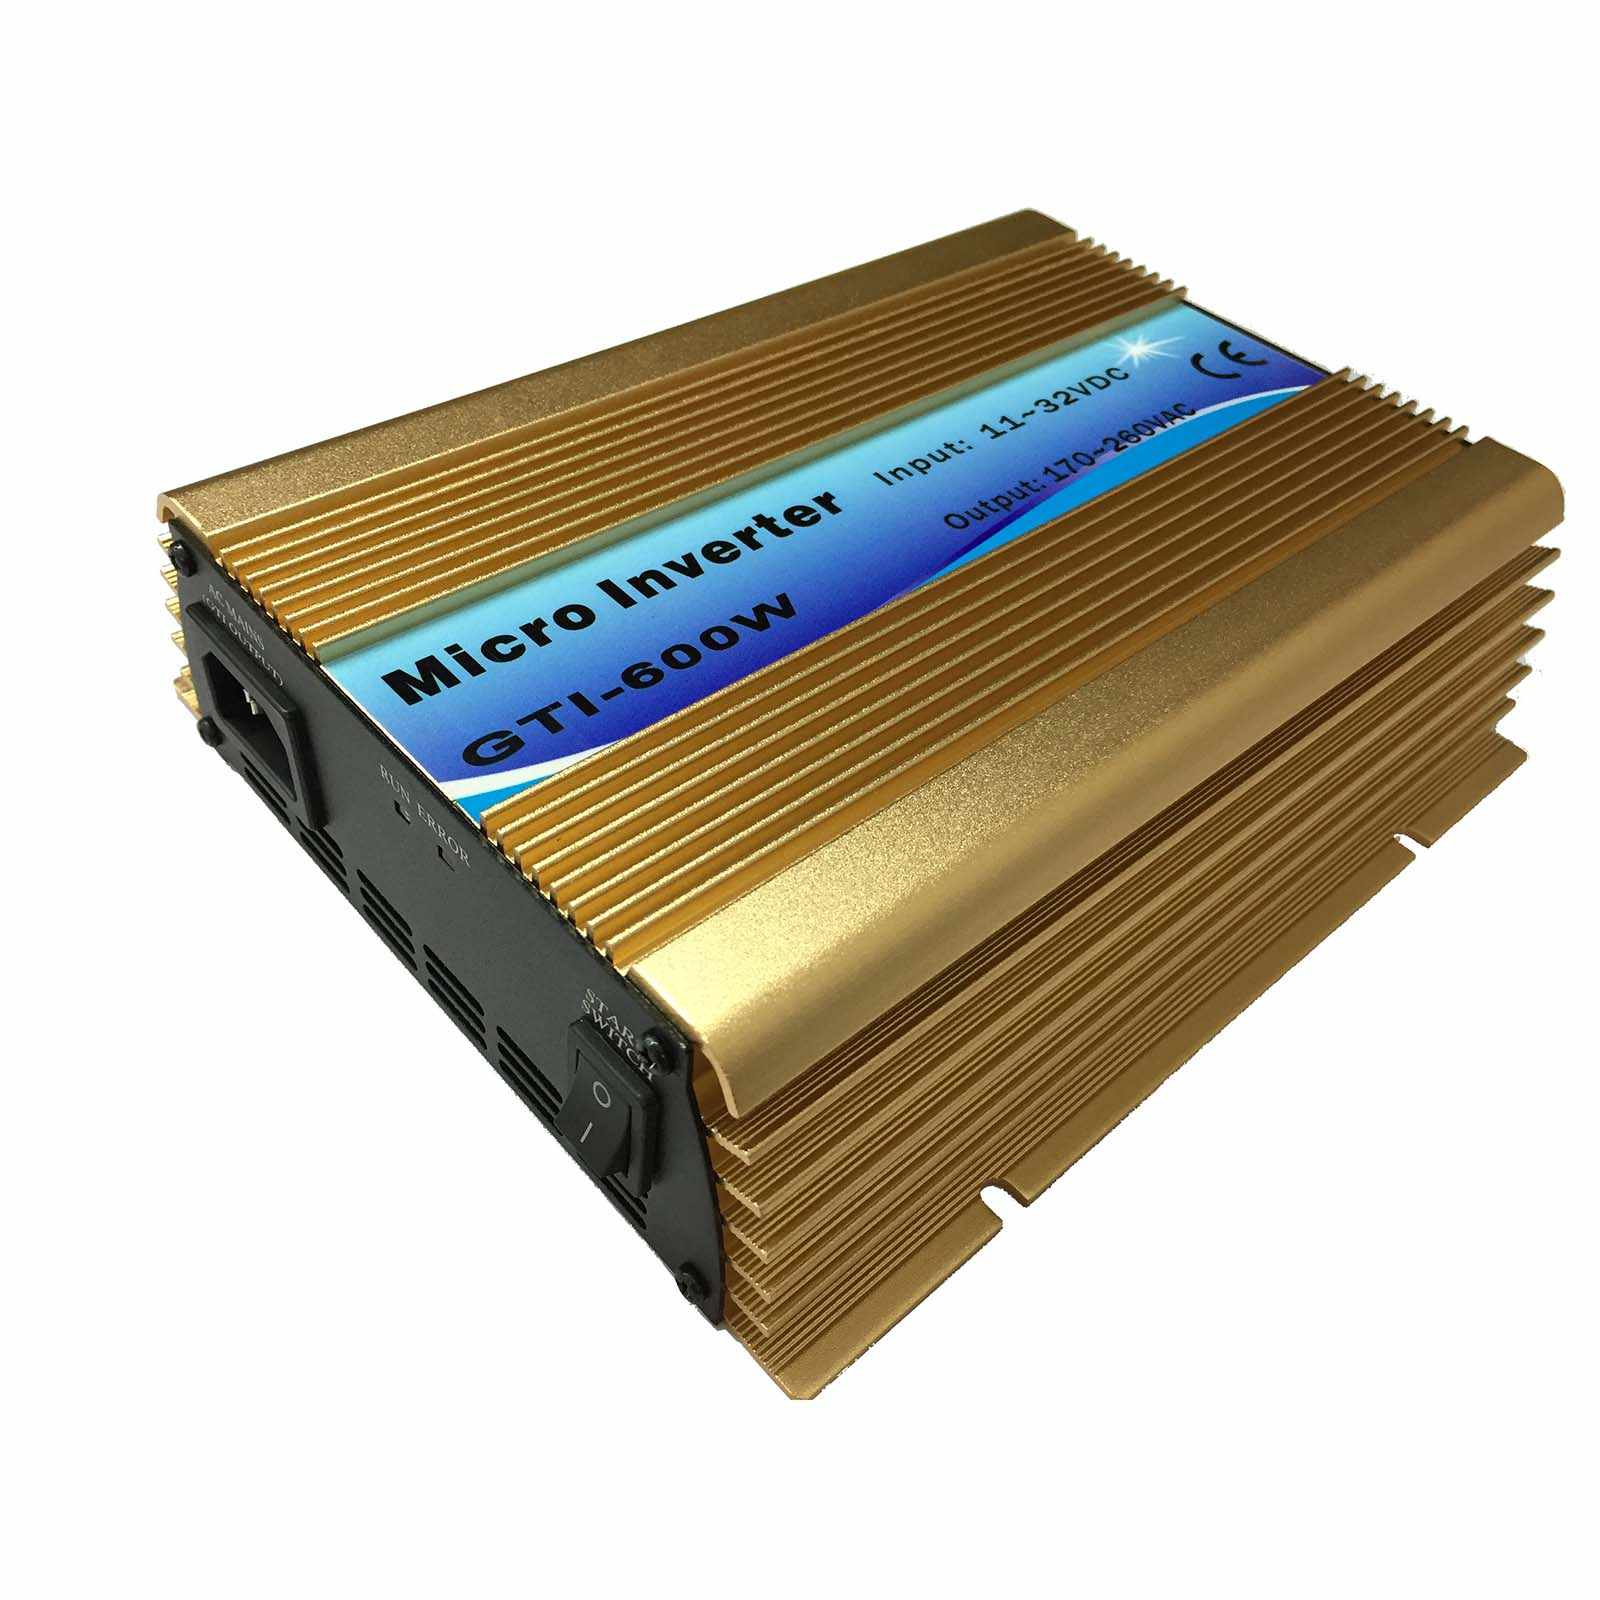 600W רשת עניבה מהפך 600W MPPT טהור סינוס גל מהפך DC18V או 24V/36V כדי AC110V או 230V שימוש עבור פנל סולארי CE זהב צבע